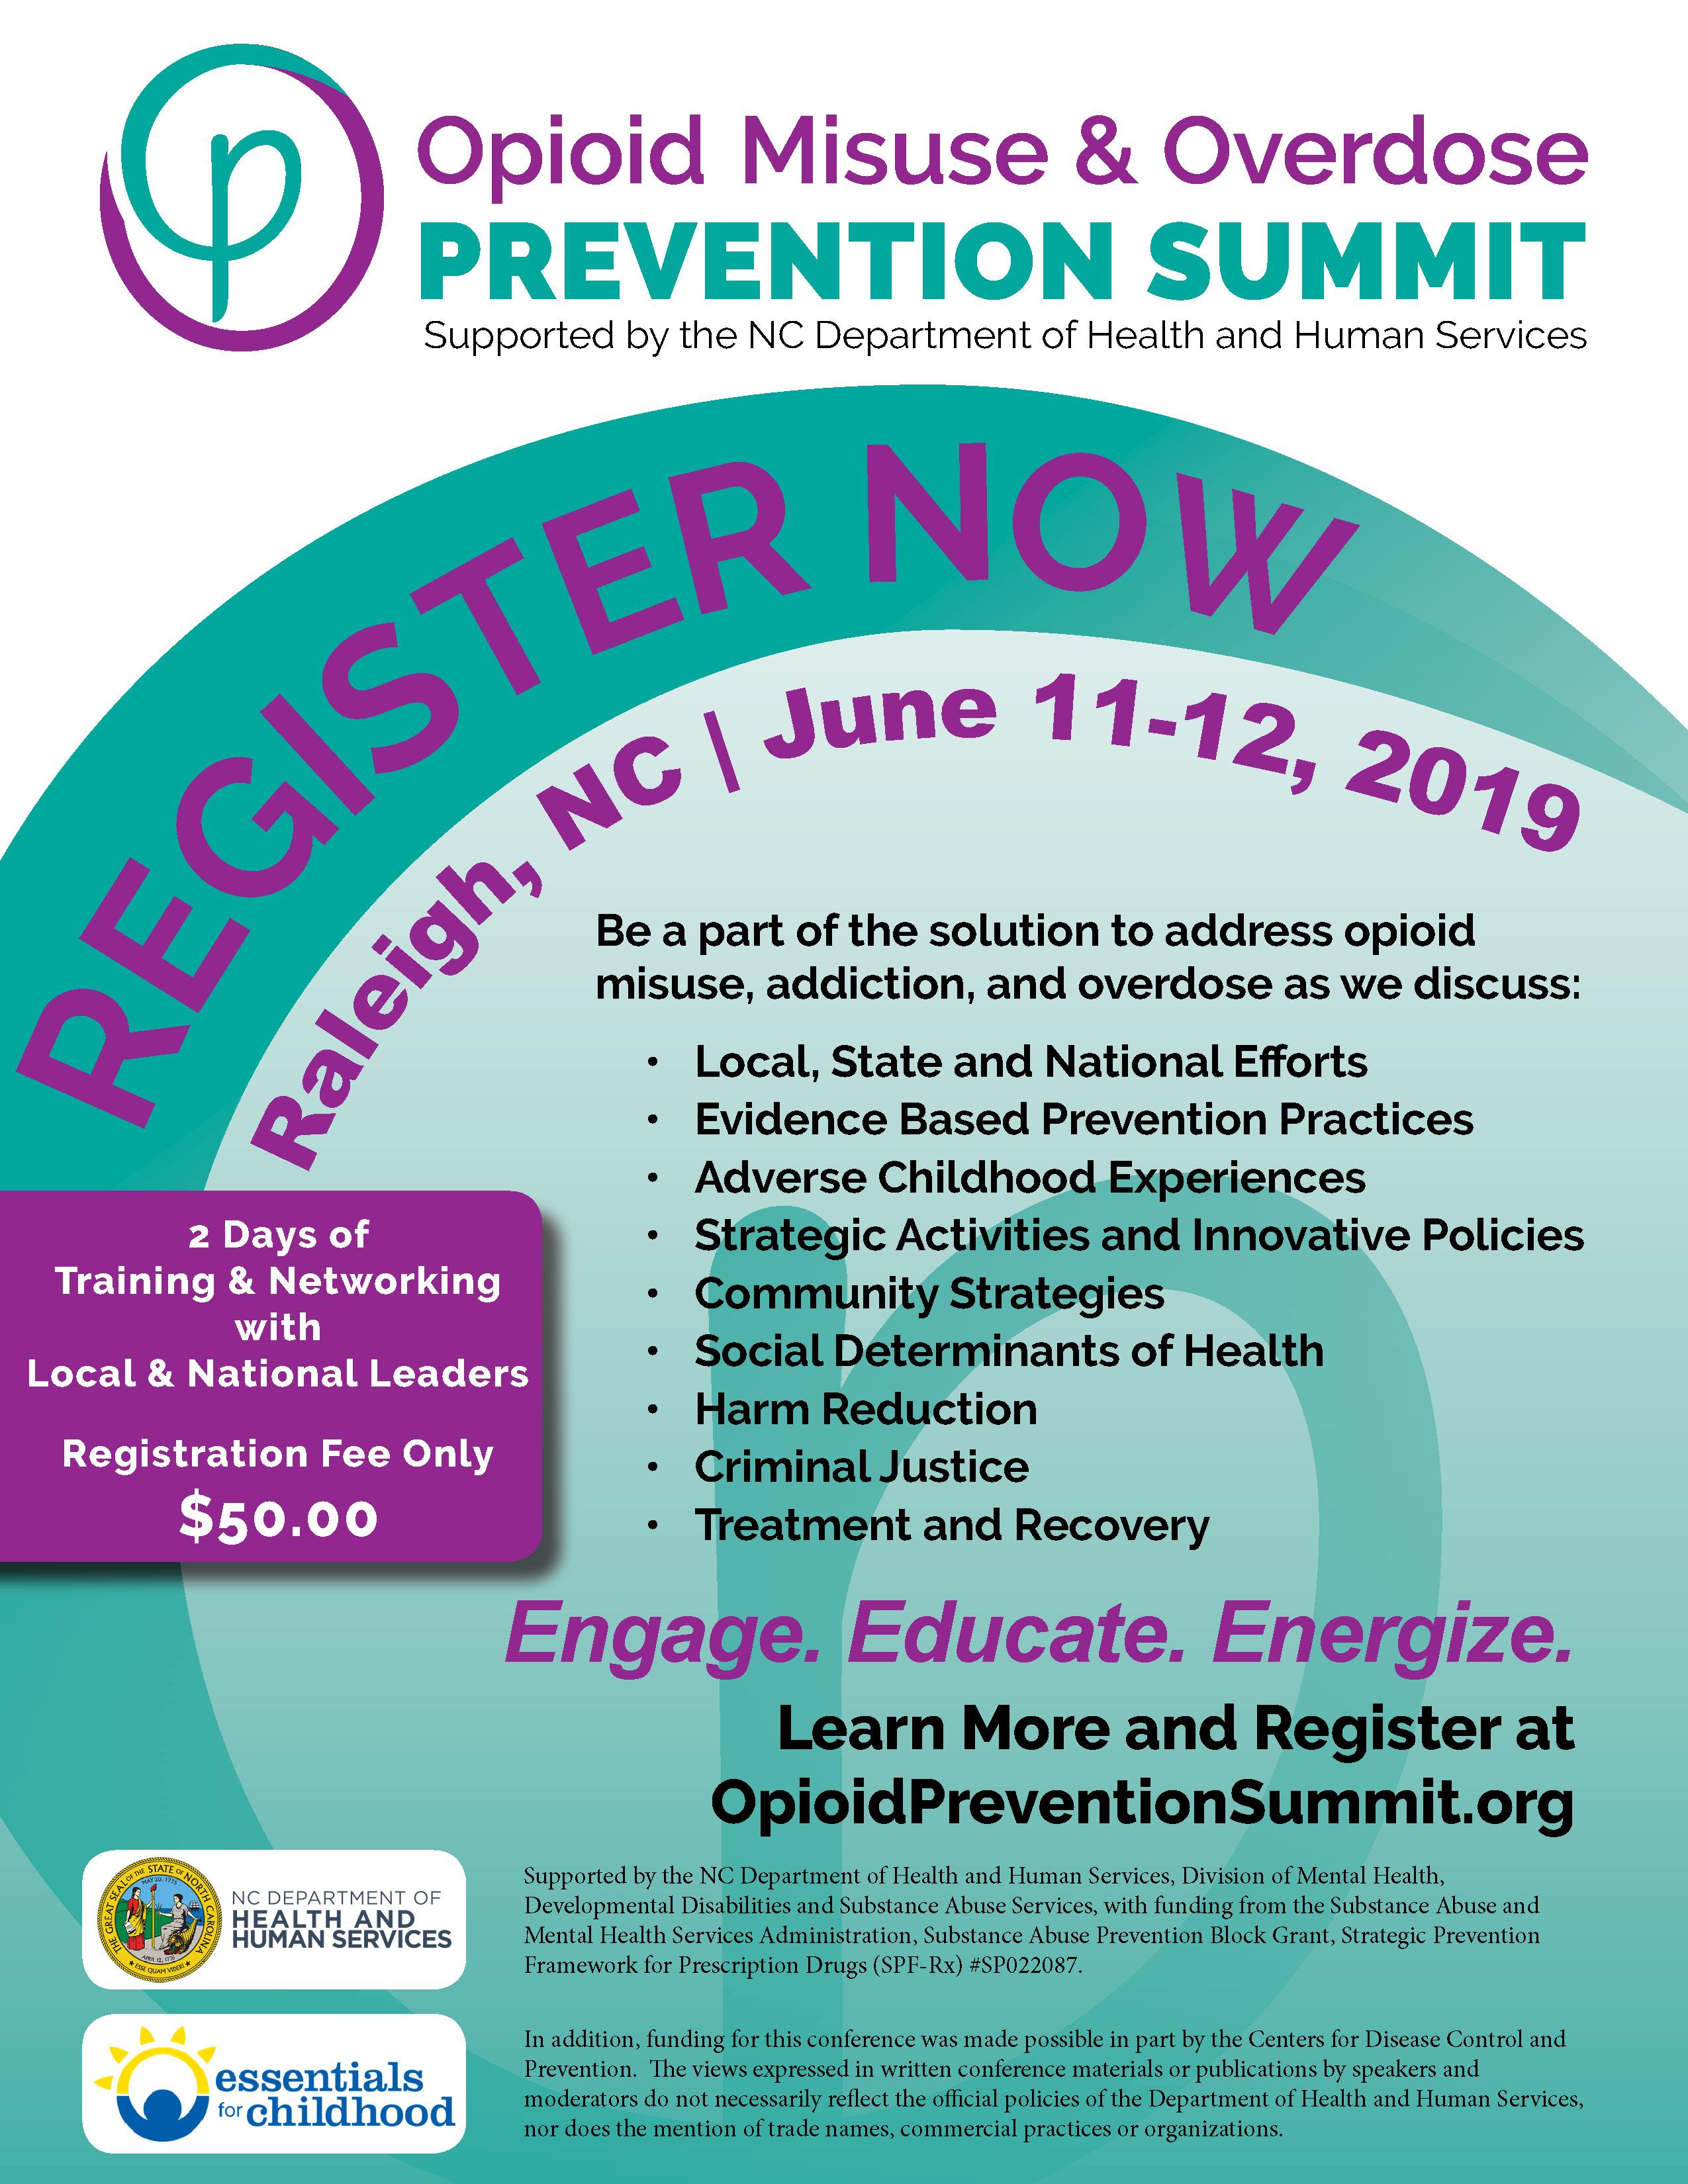 Opioid Summit 2019 | June 11-12, 2019 | Register Now